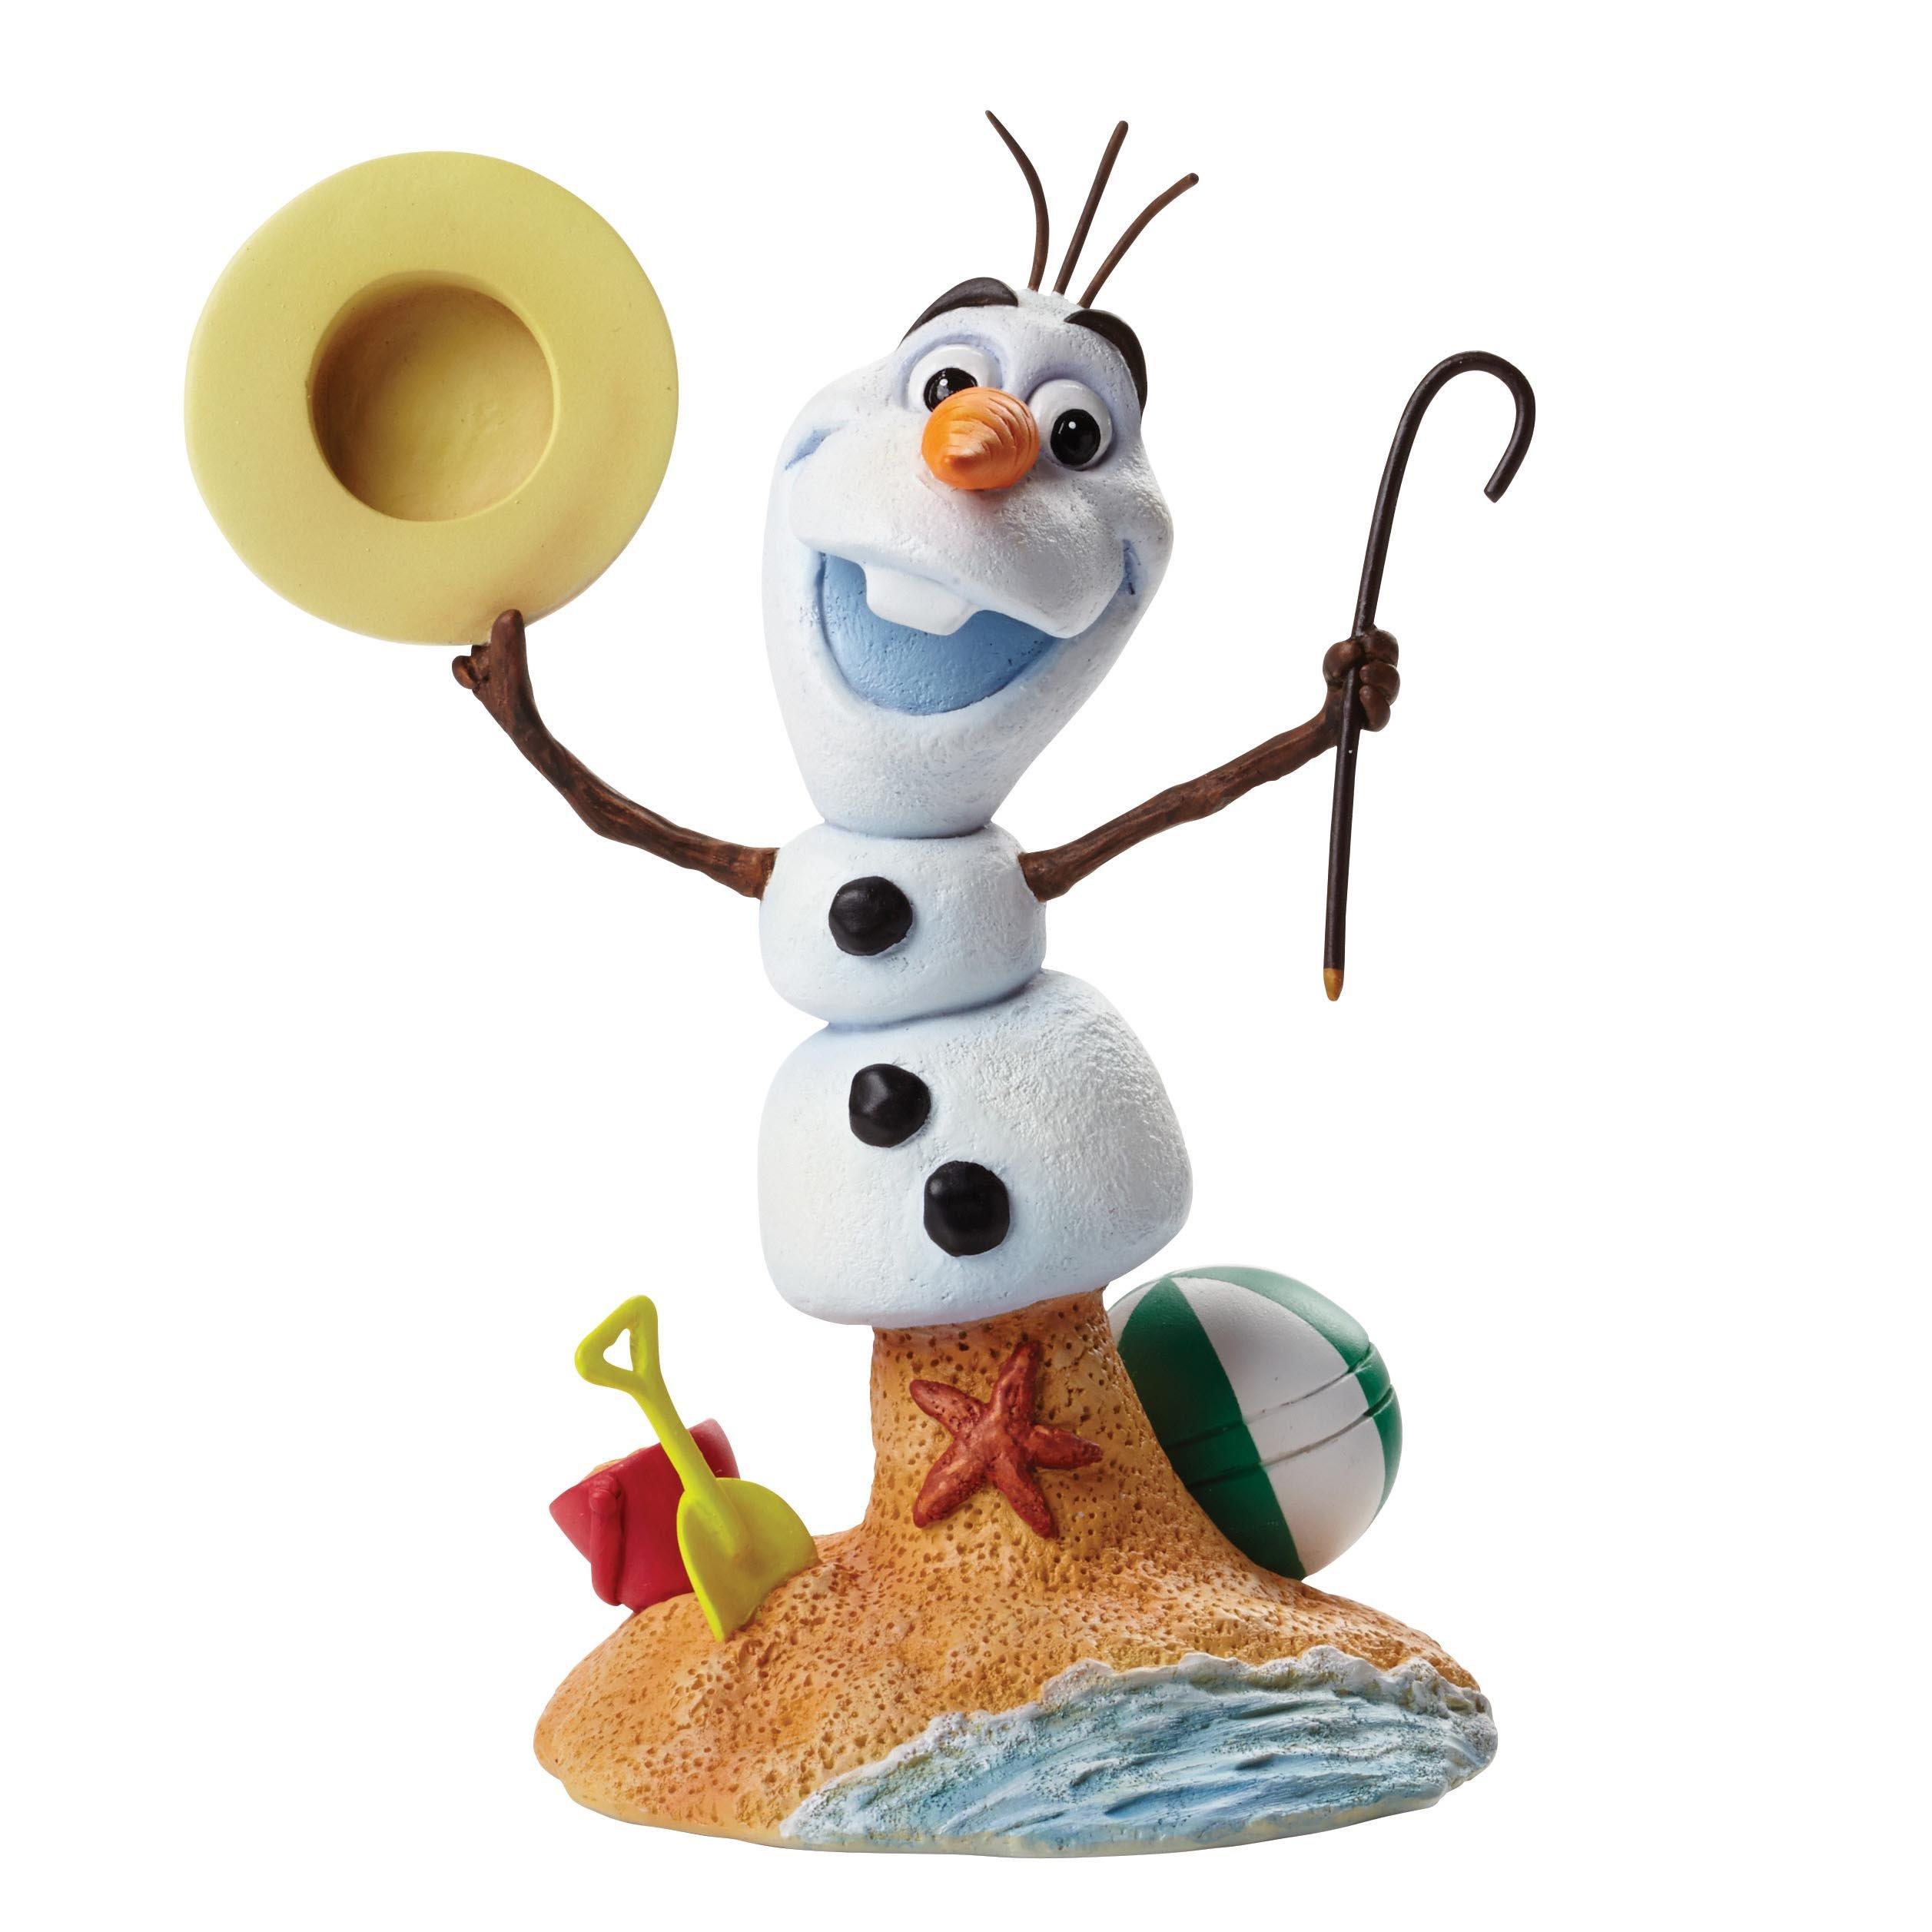 Grand Jester Studios Disney Frozen Olaf the Snowman Beach Bust Figurine 4046190